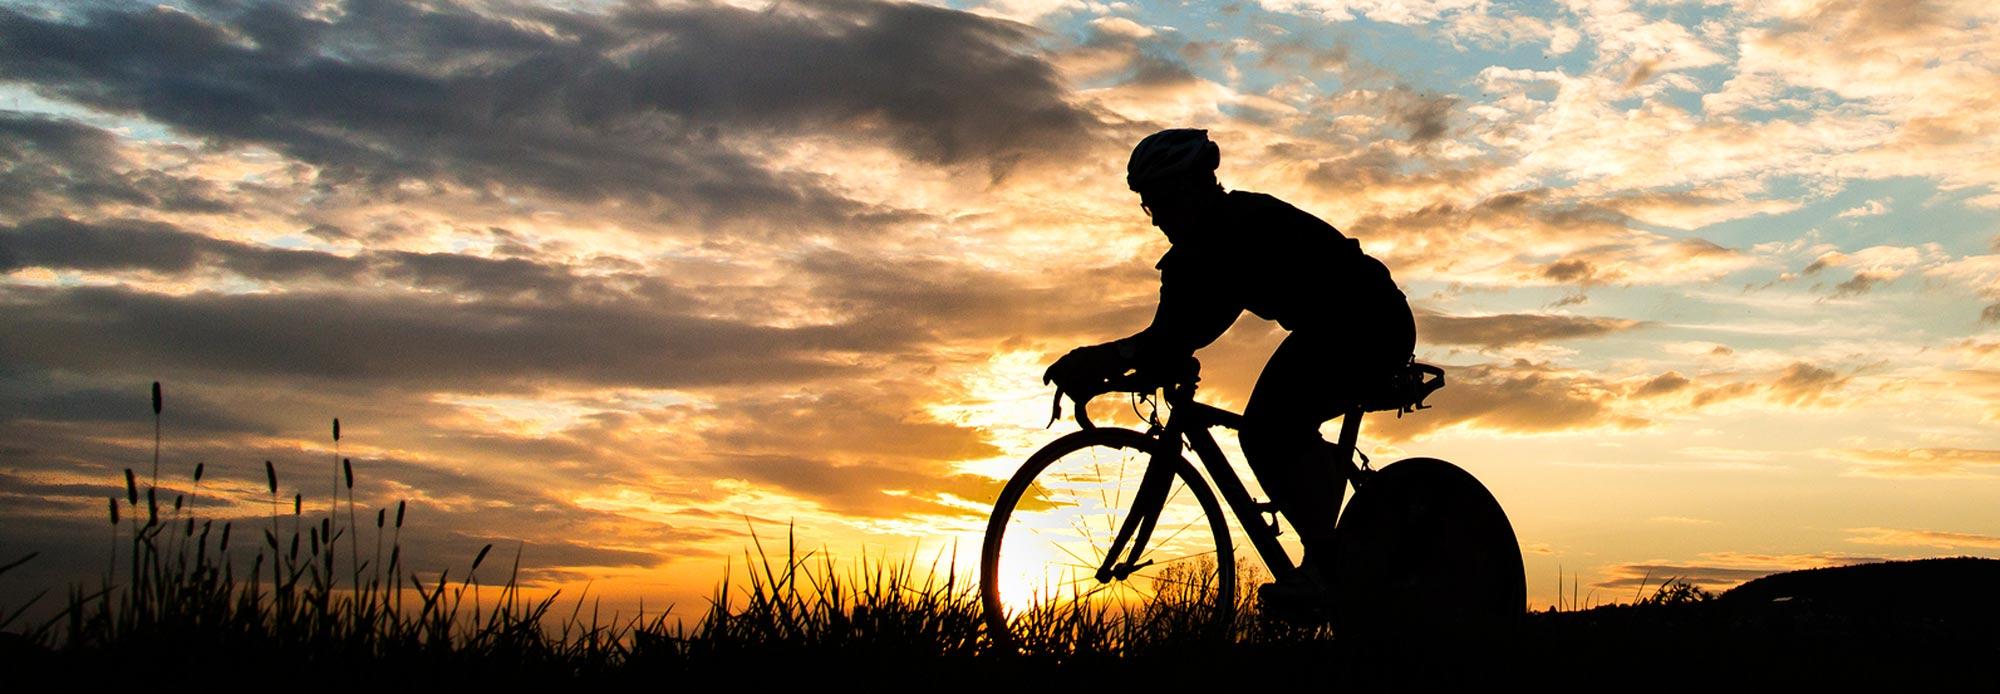 ciclista_tramonto